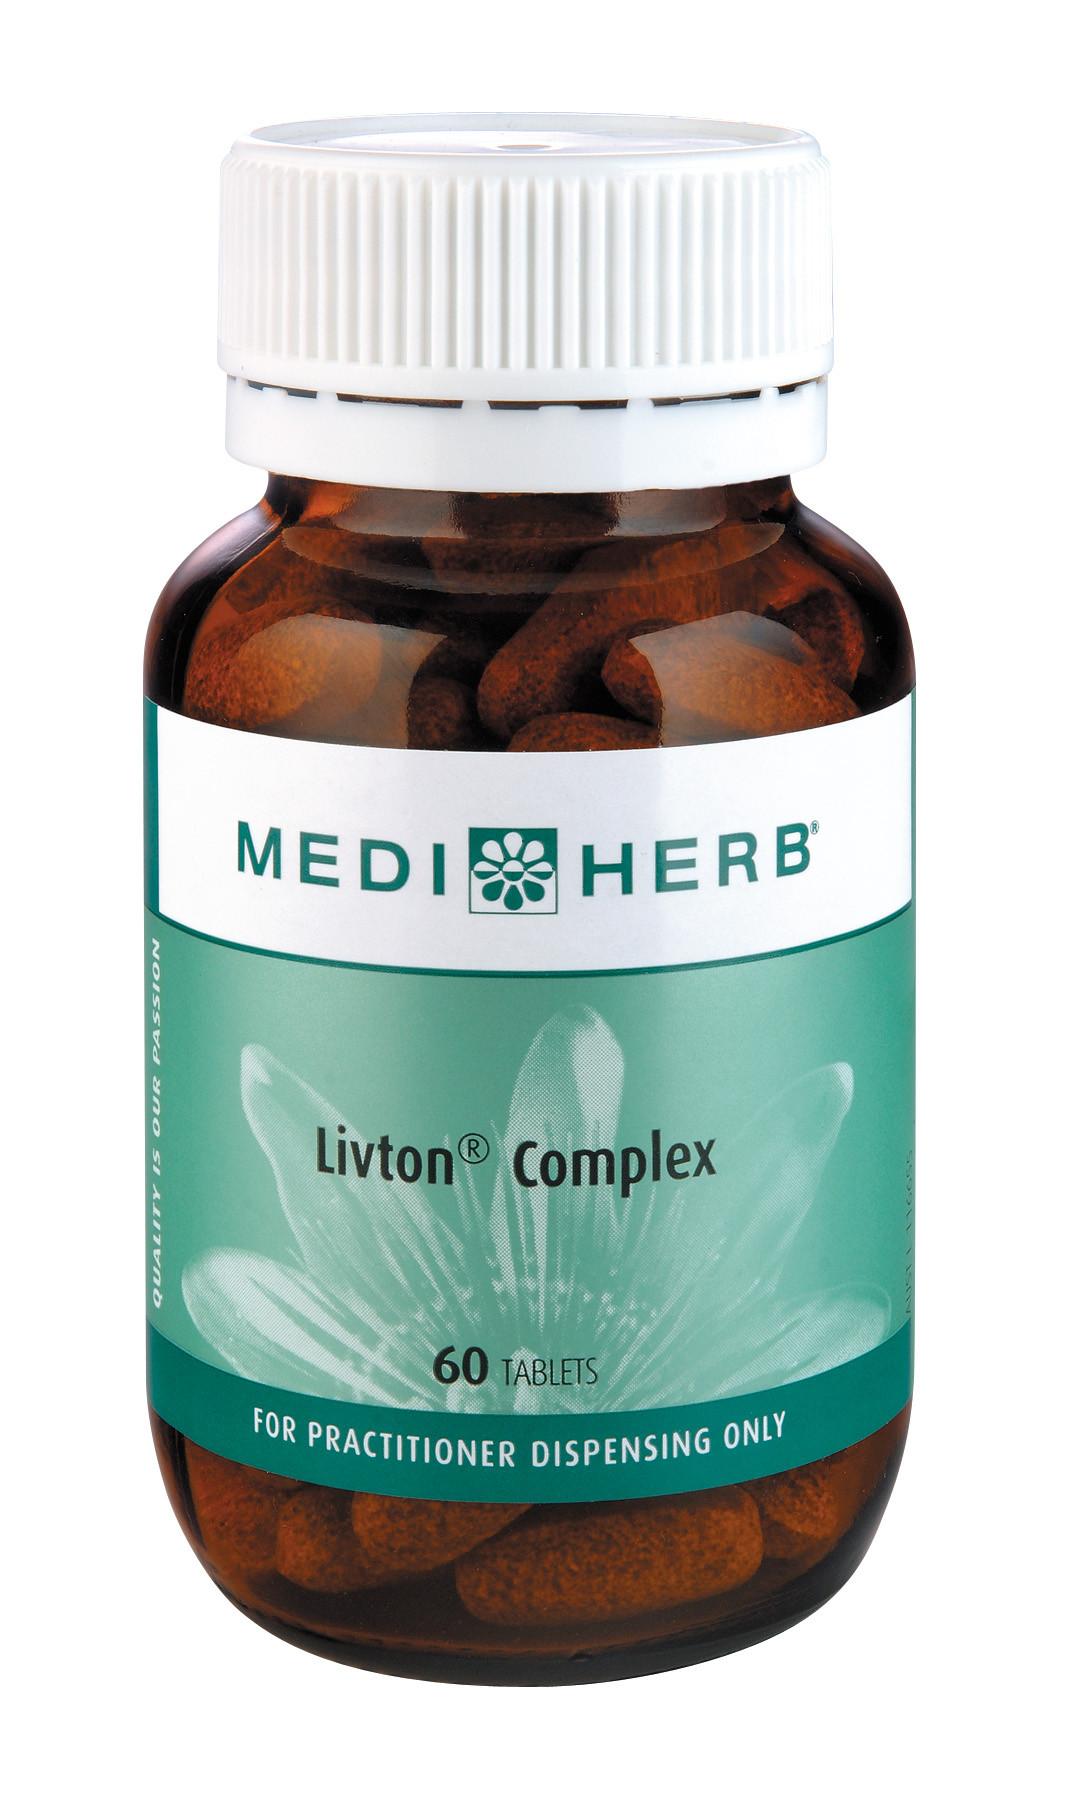 Livton Complex, supplement, liver support, liver detoxification, liver health, detox, detoxification, digestive aid, milk thistle